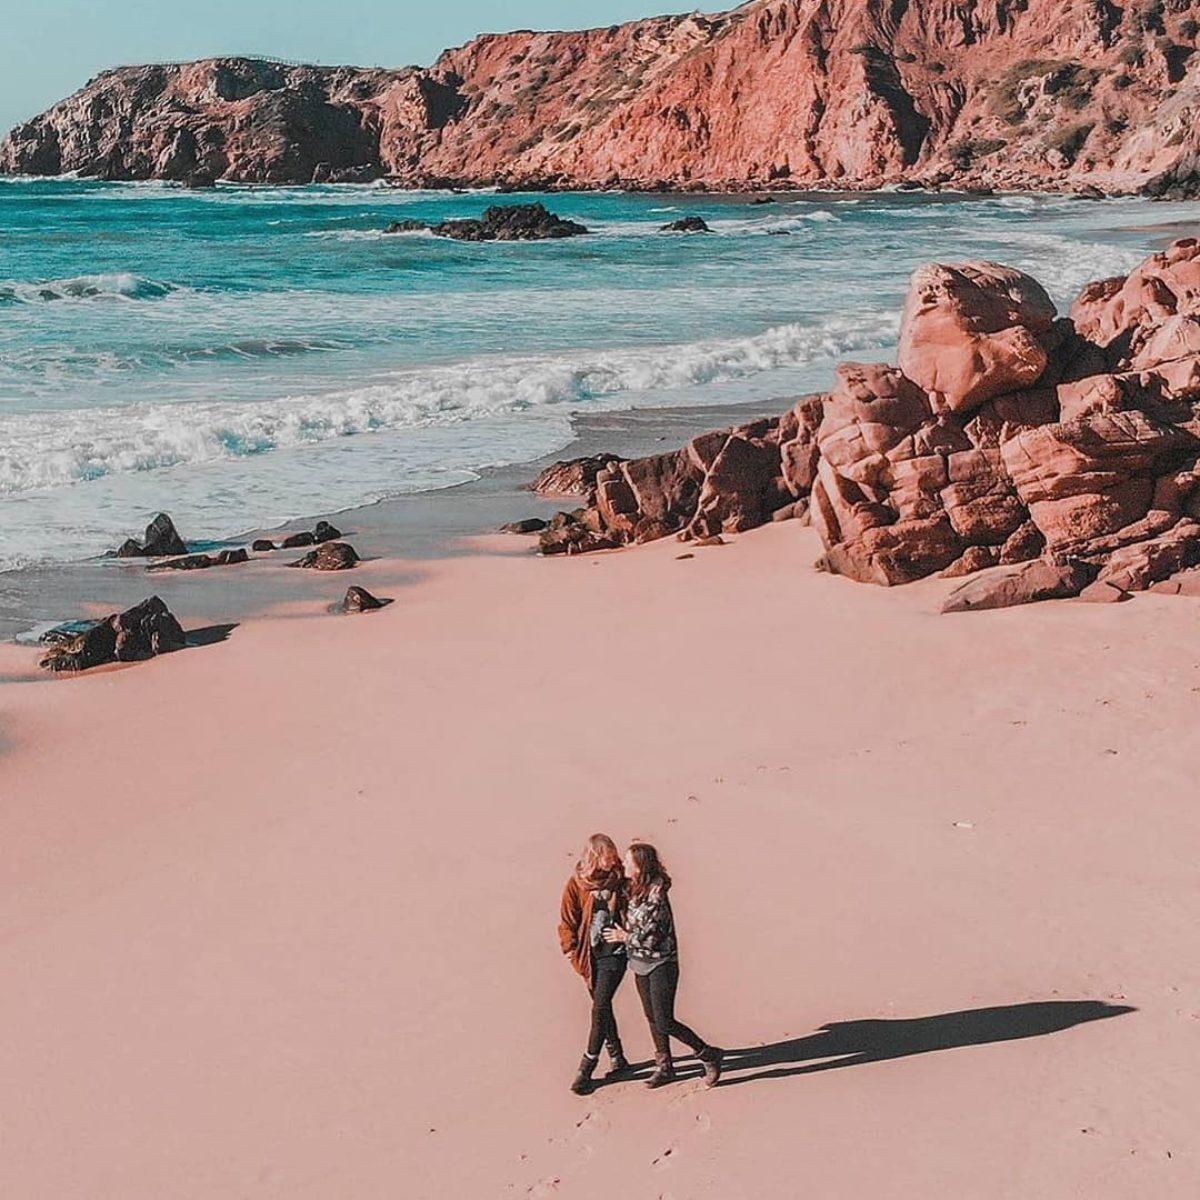 Couple of women walking in the beach near the seashore, Portugal